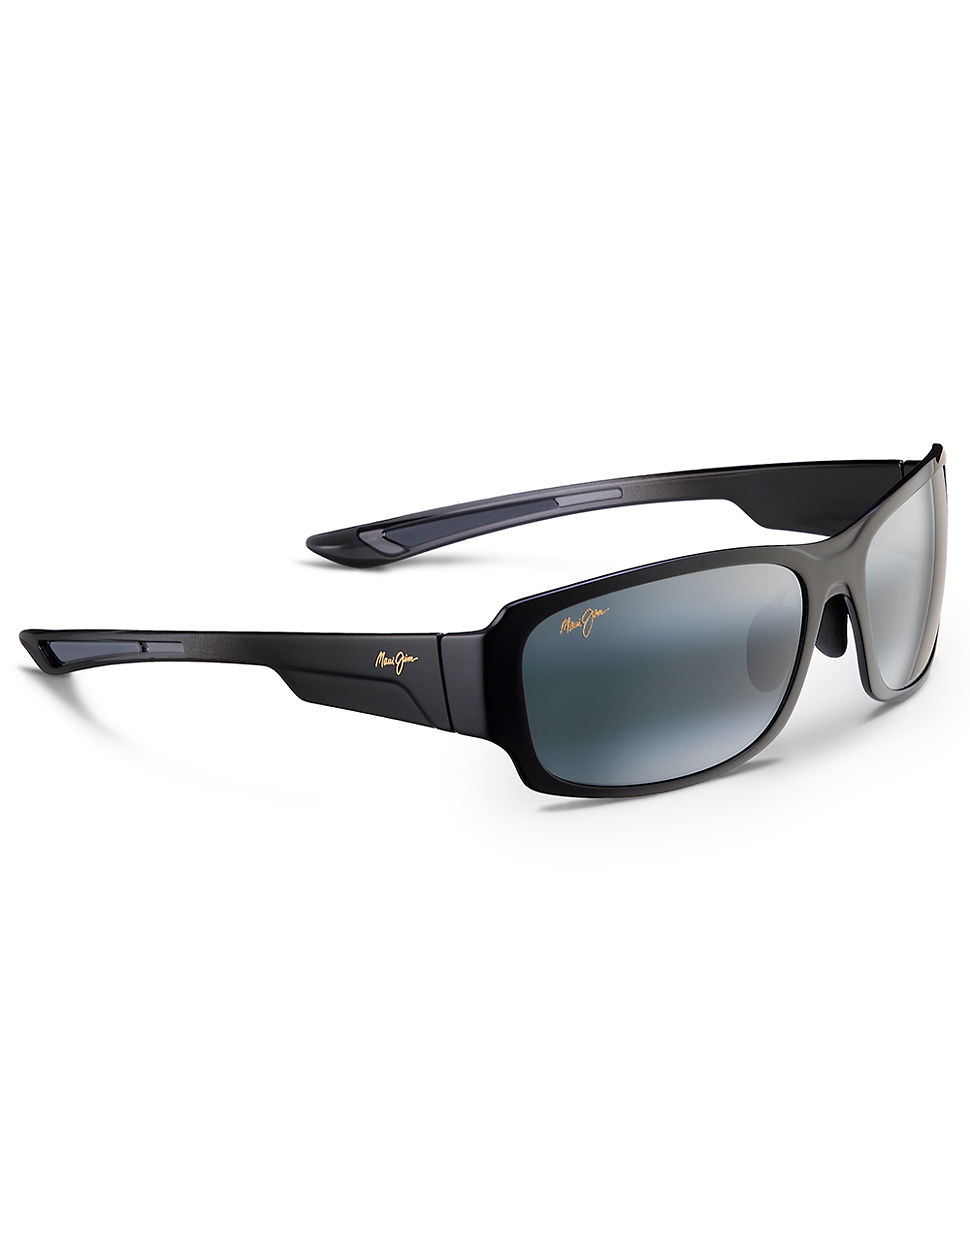 3975156845 Best Maui Jim Sunglasses For Men - Bitterroot Public Library